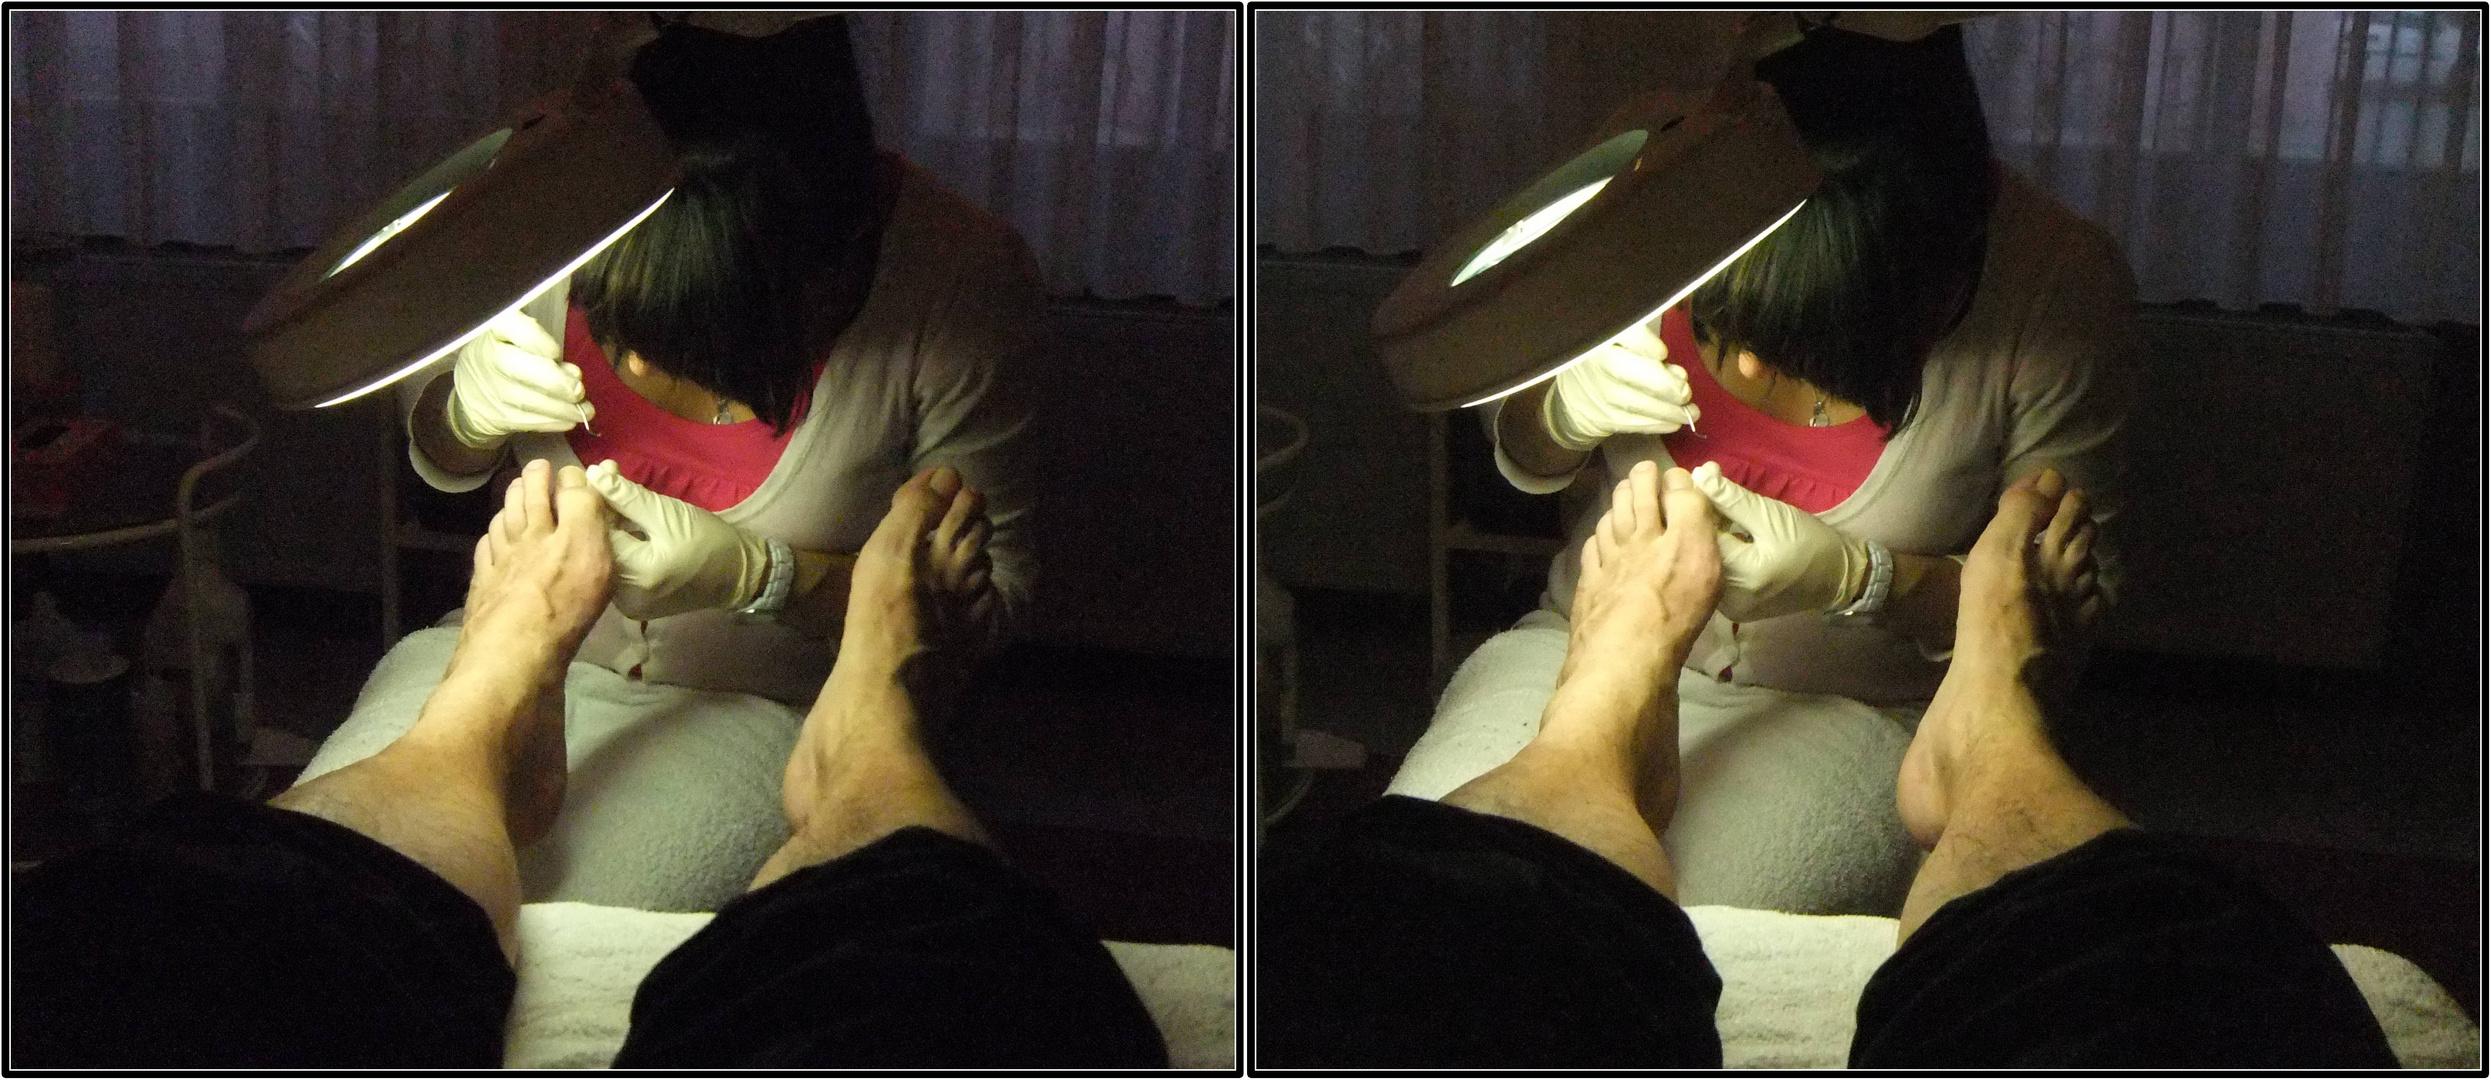 Fußpflege 3D Kreuzblick